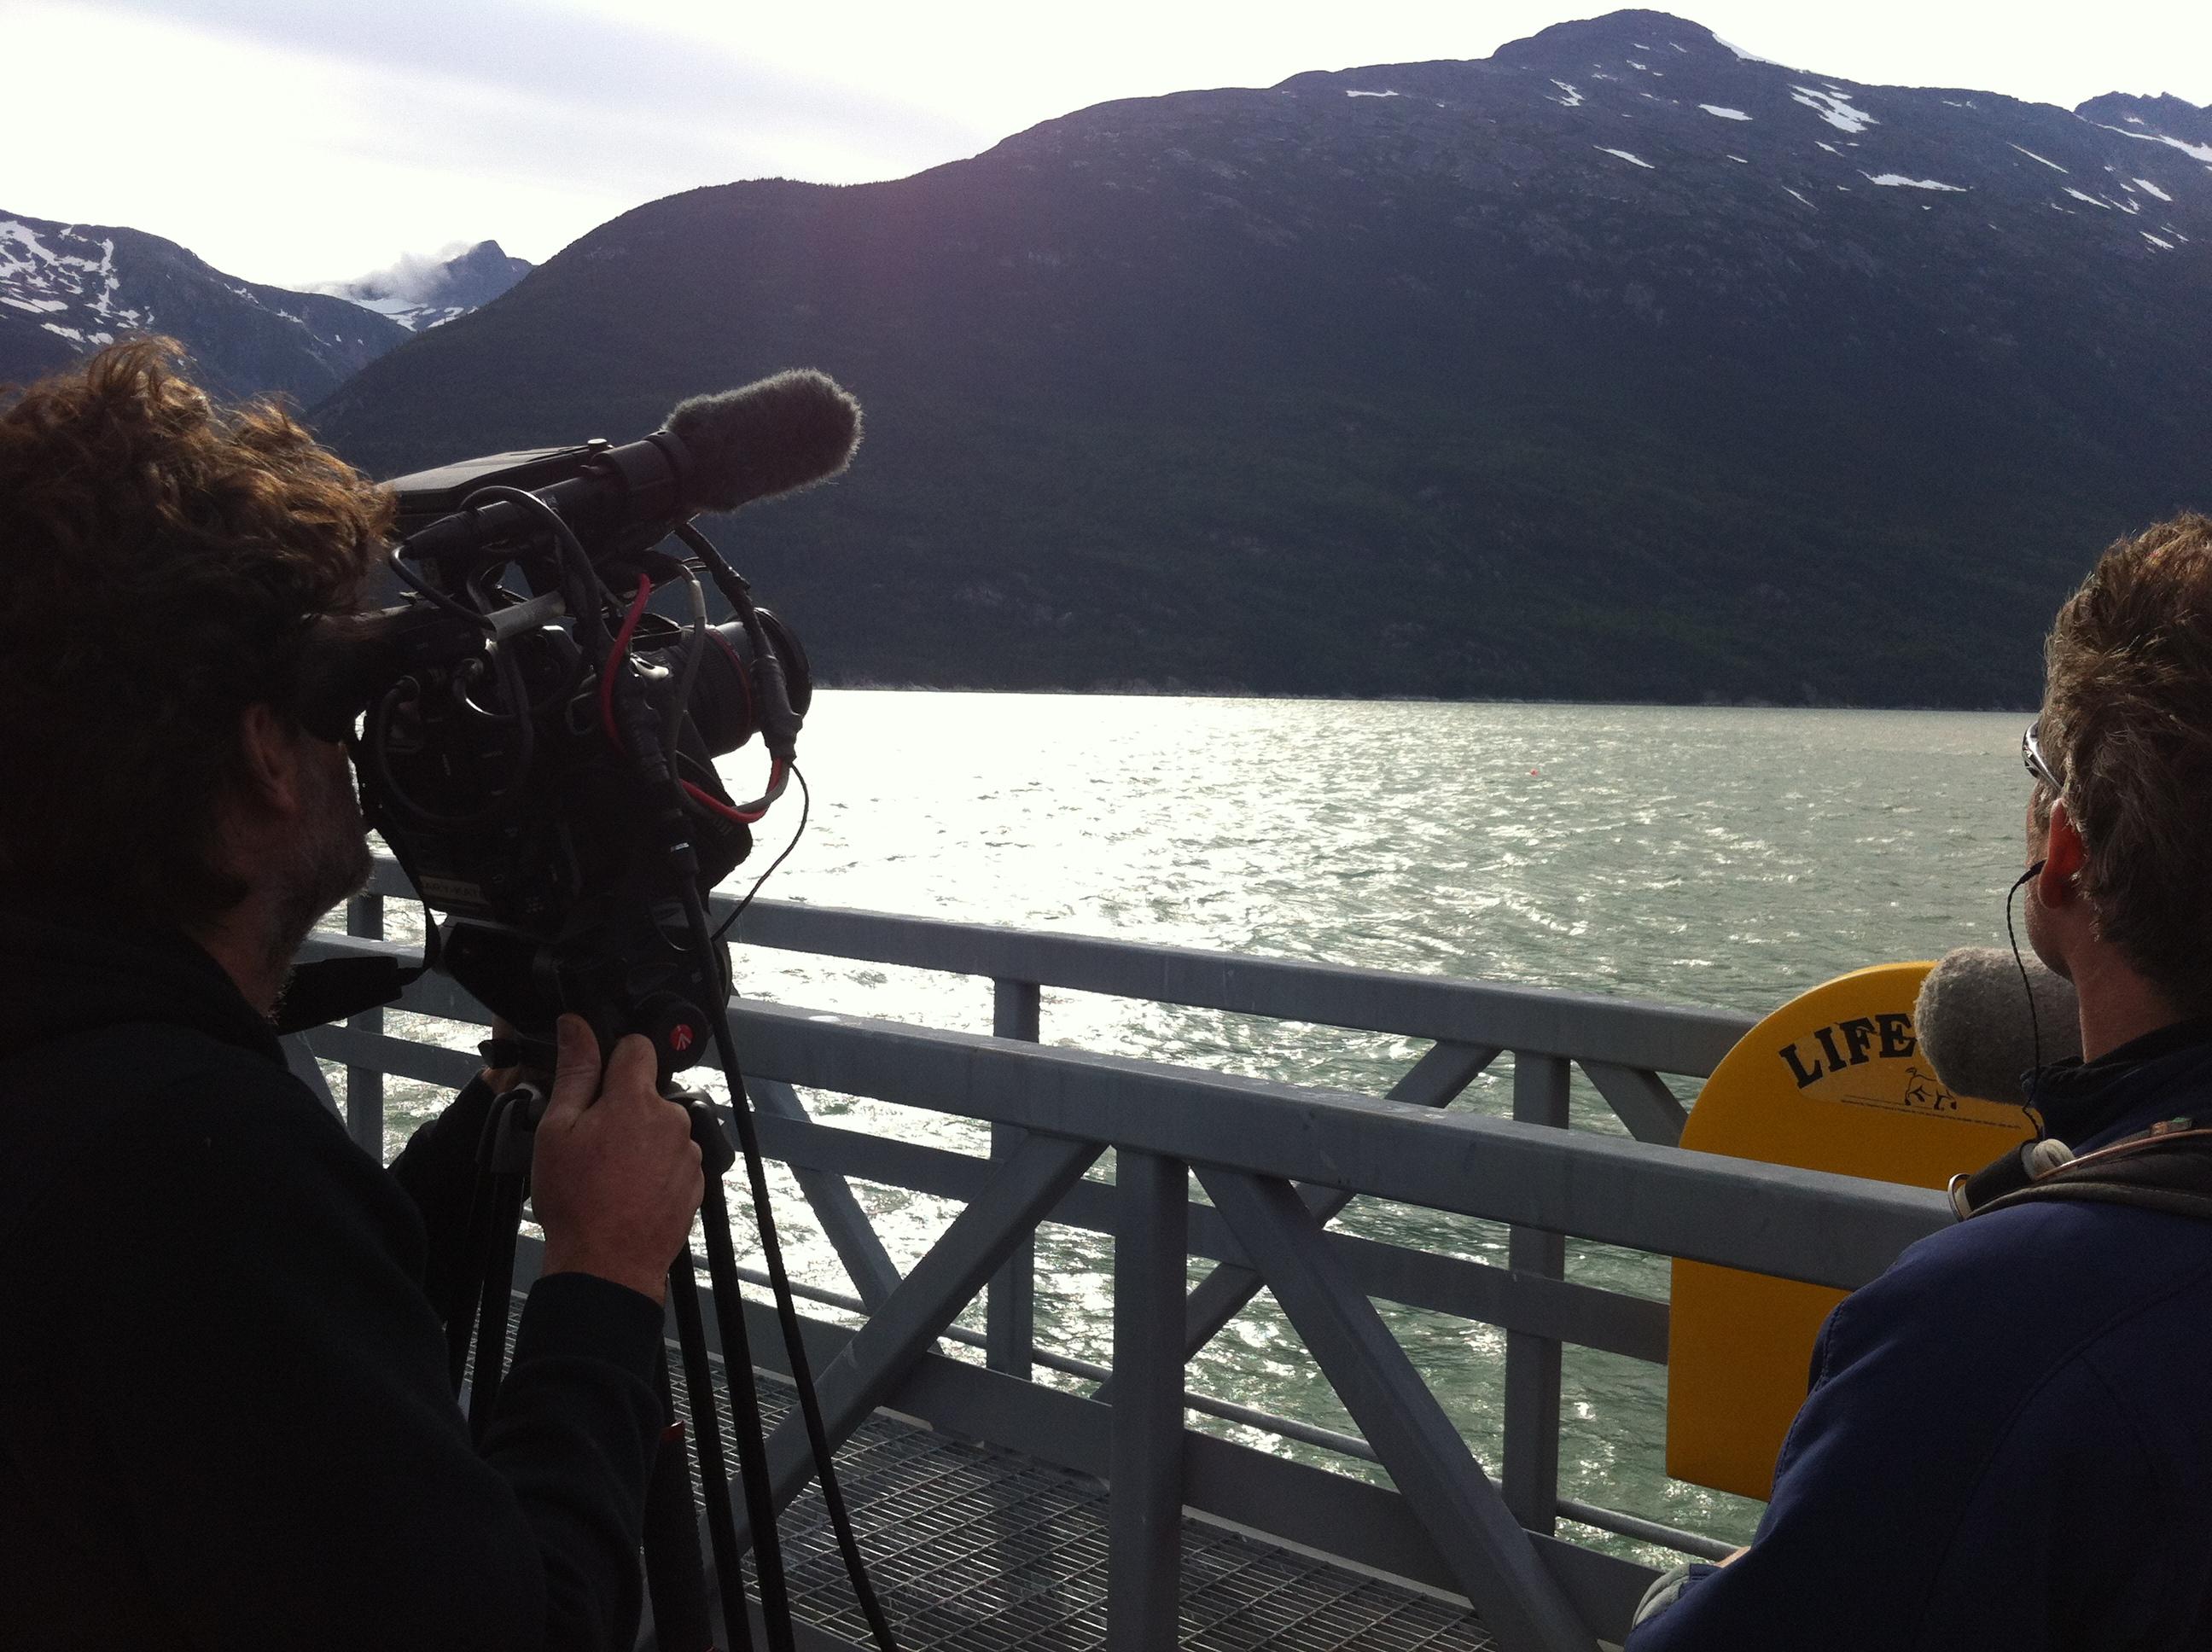 Making of The Klondike Gold Rush